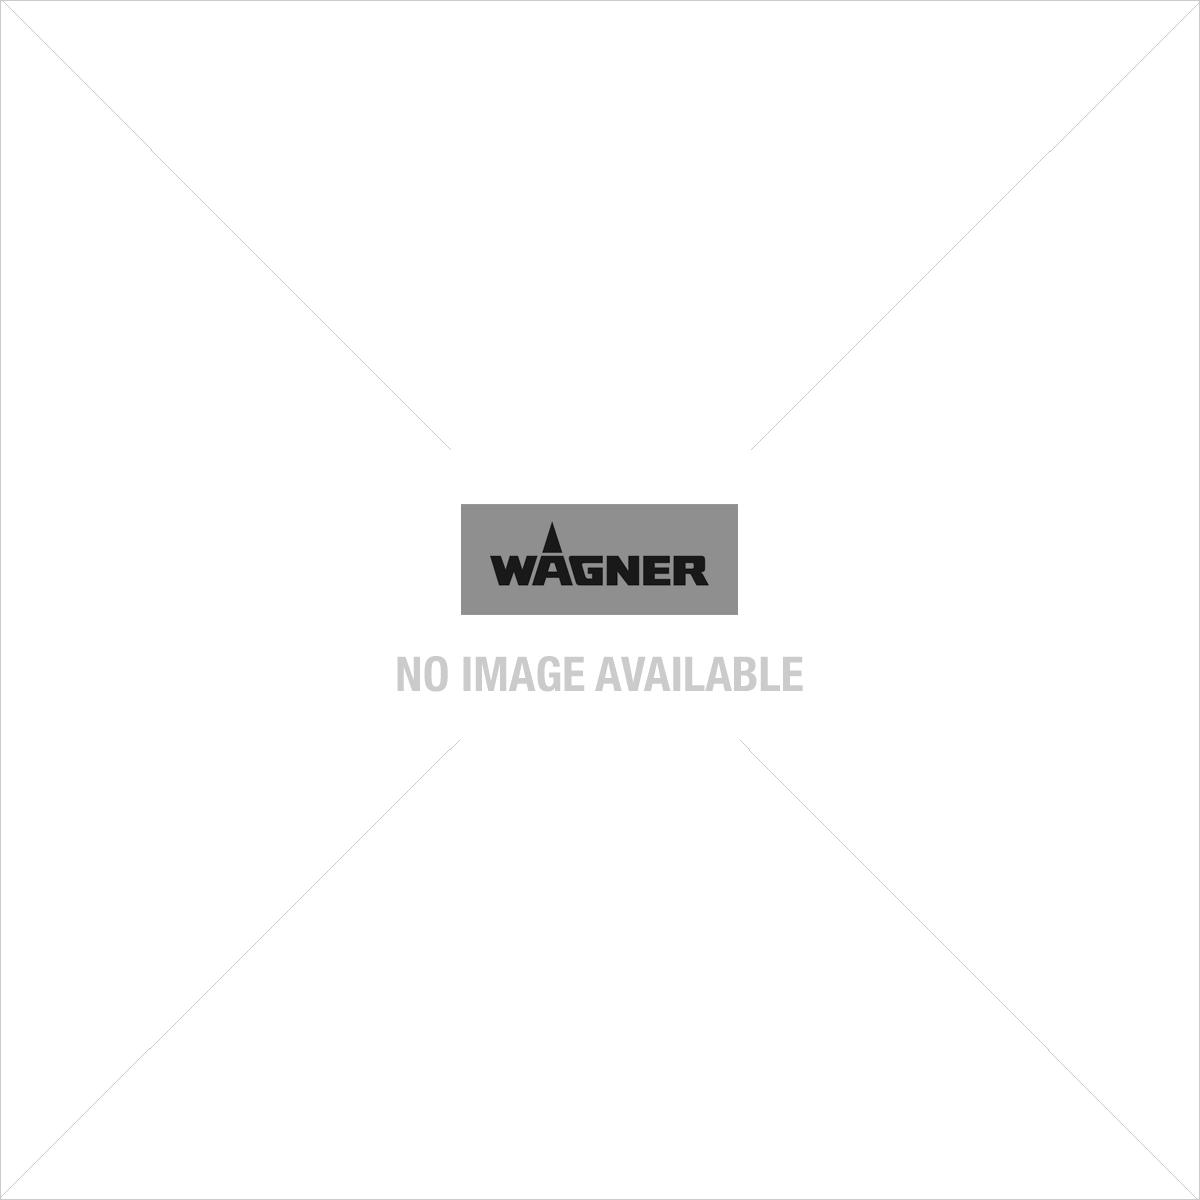 Kit de masquage peinture Wagner - Petit